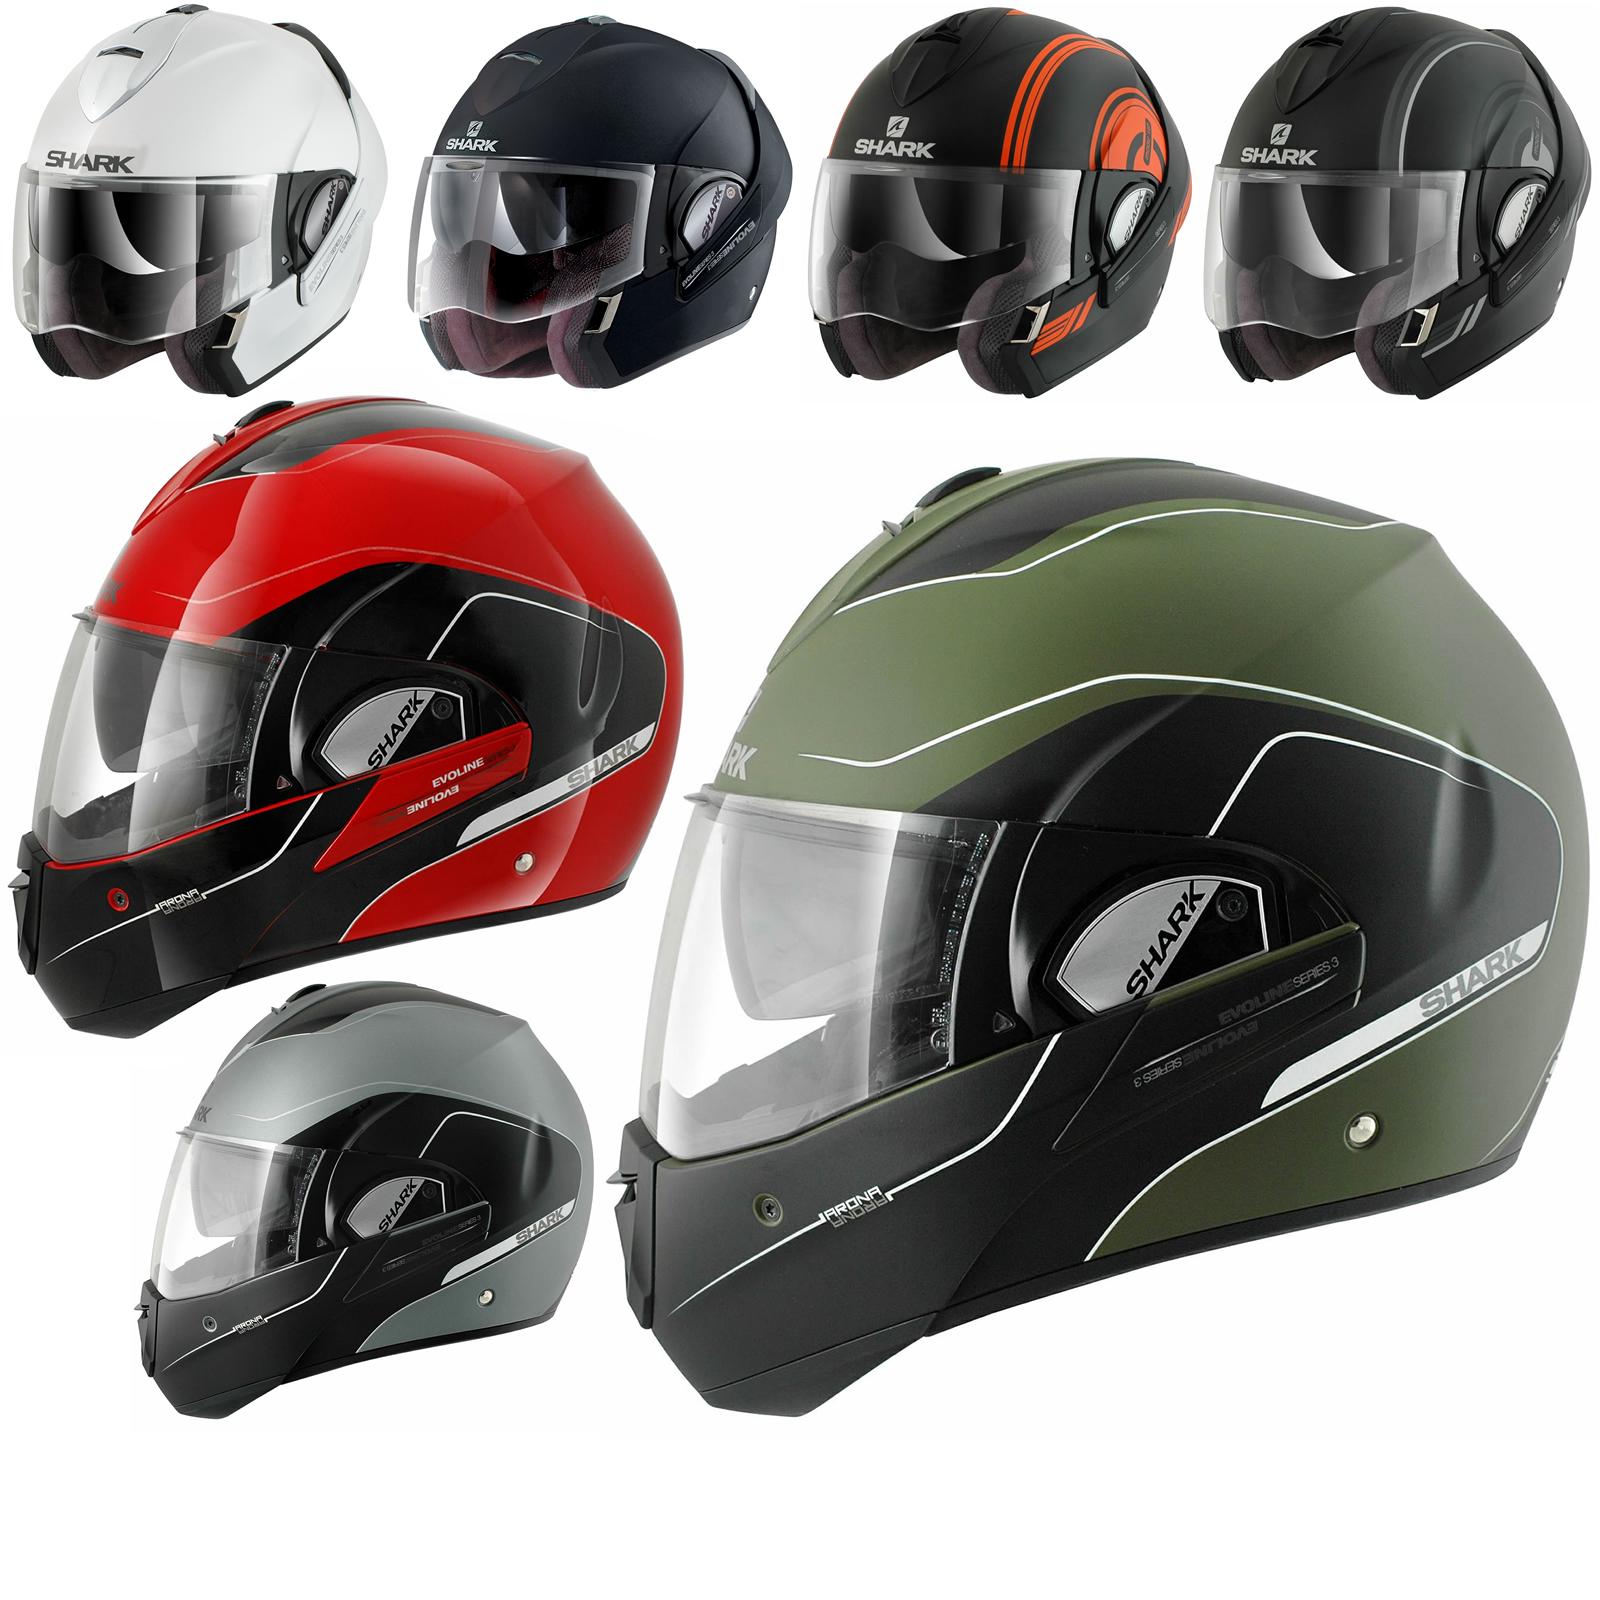 shark evoline series 3 motorcycle helmet free balaclava neck tube flip front helmets. Black Bedroom Furniture Sets. Home Design Ideas